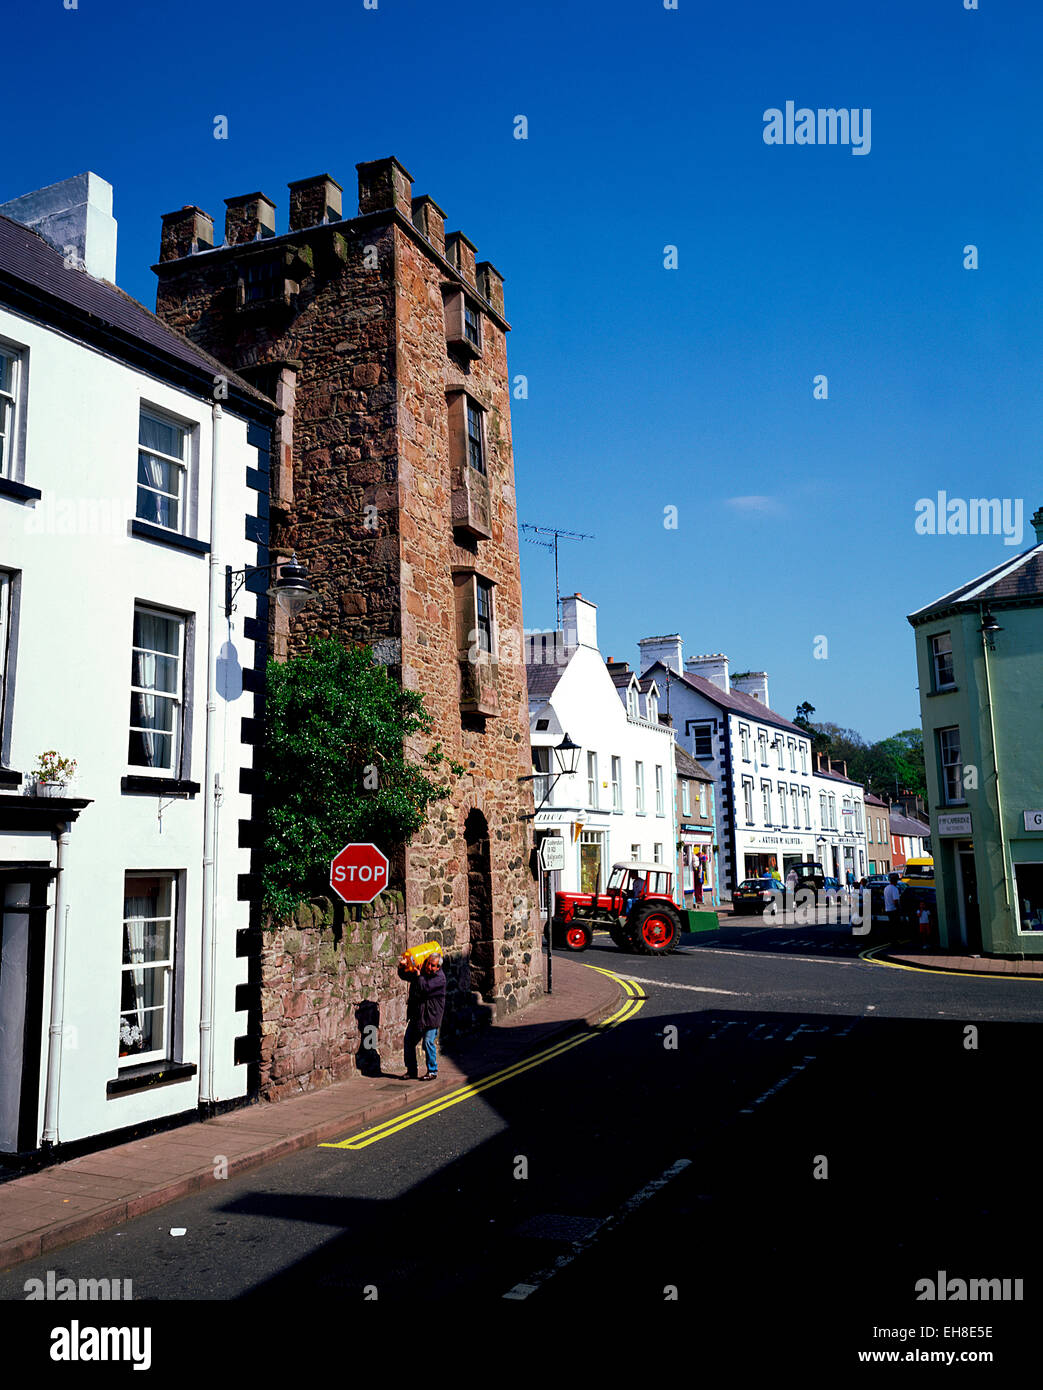 Glens of Antrim, Northern Ireland - Stock Image